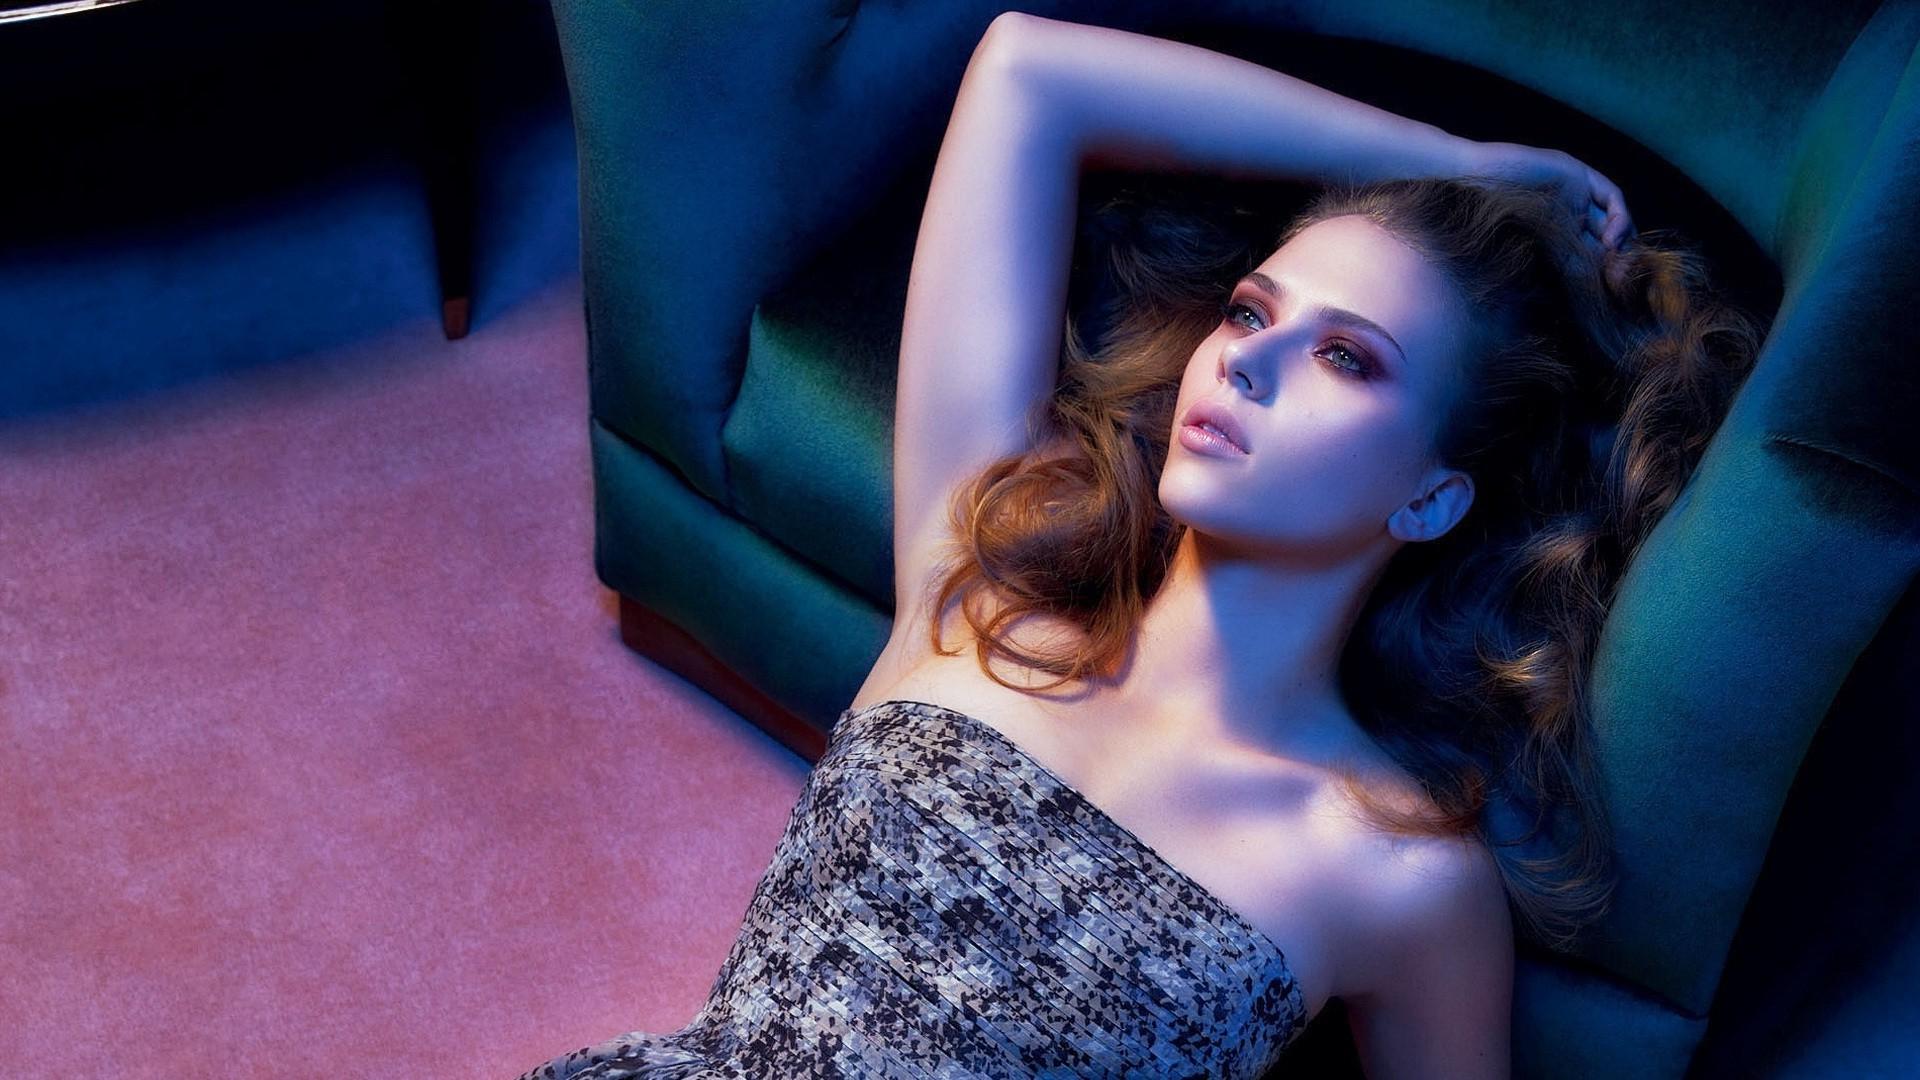 Celebridades Fondos De: Scarlett Johansson Full HD Fondo De Pantalla And Fondo De